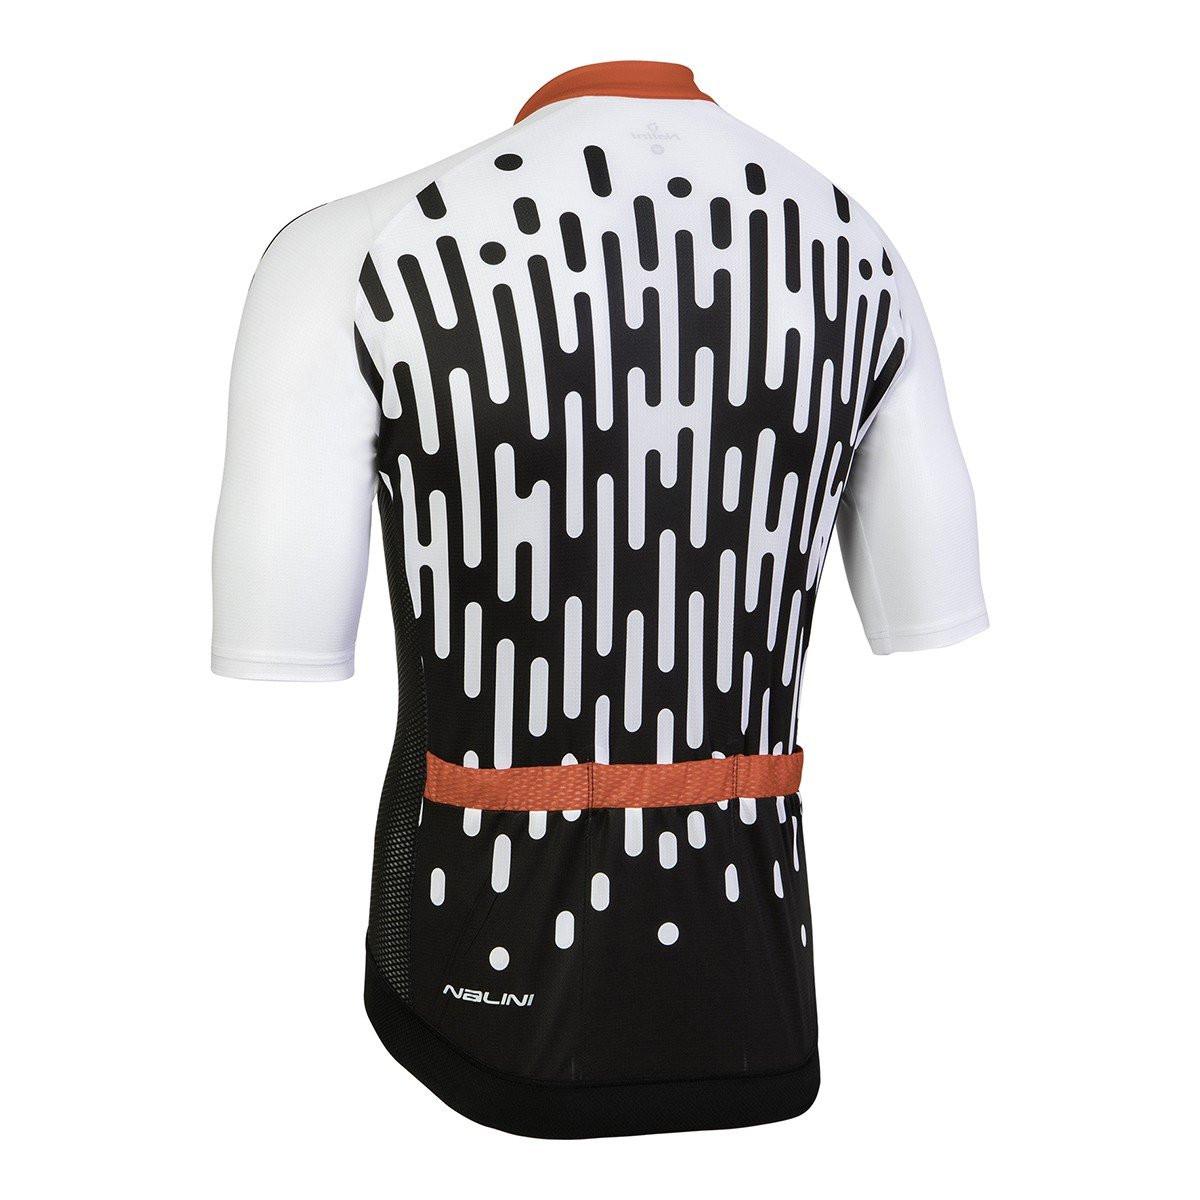 Nalini Podio White Black Jersey Rear